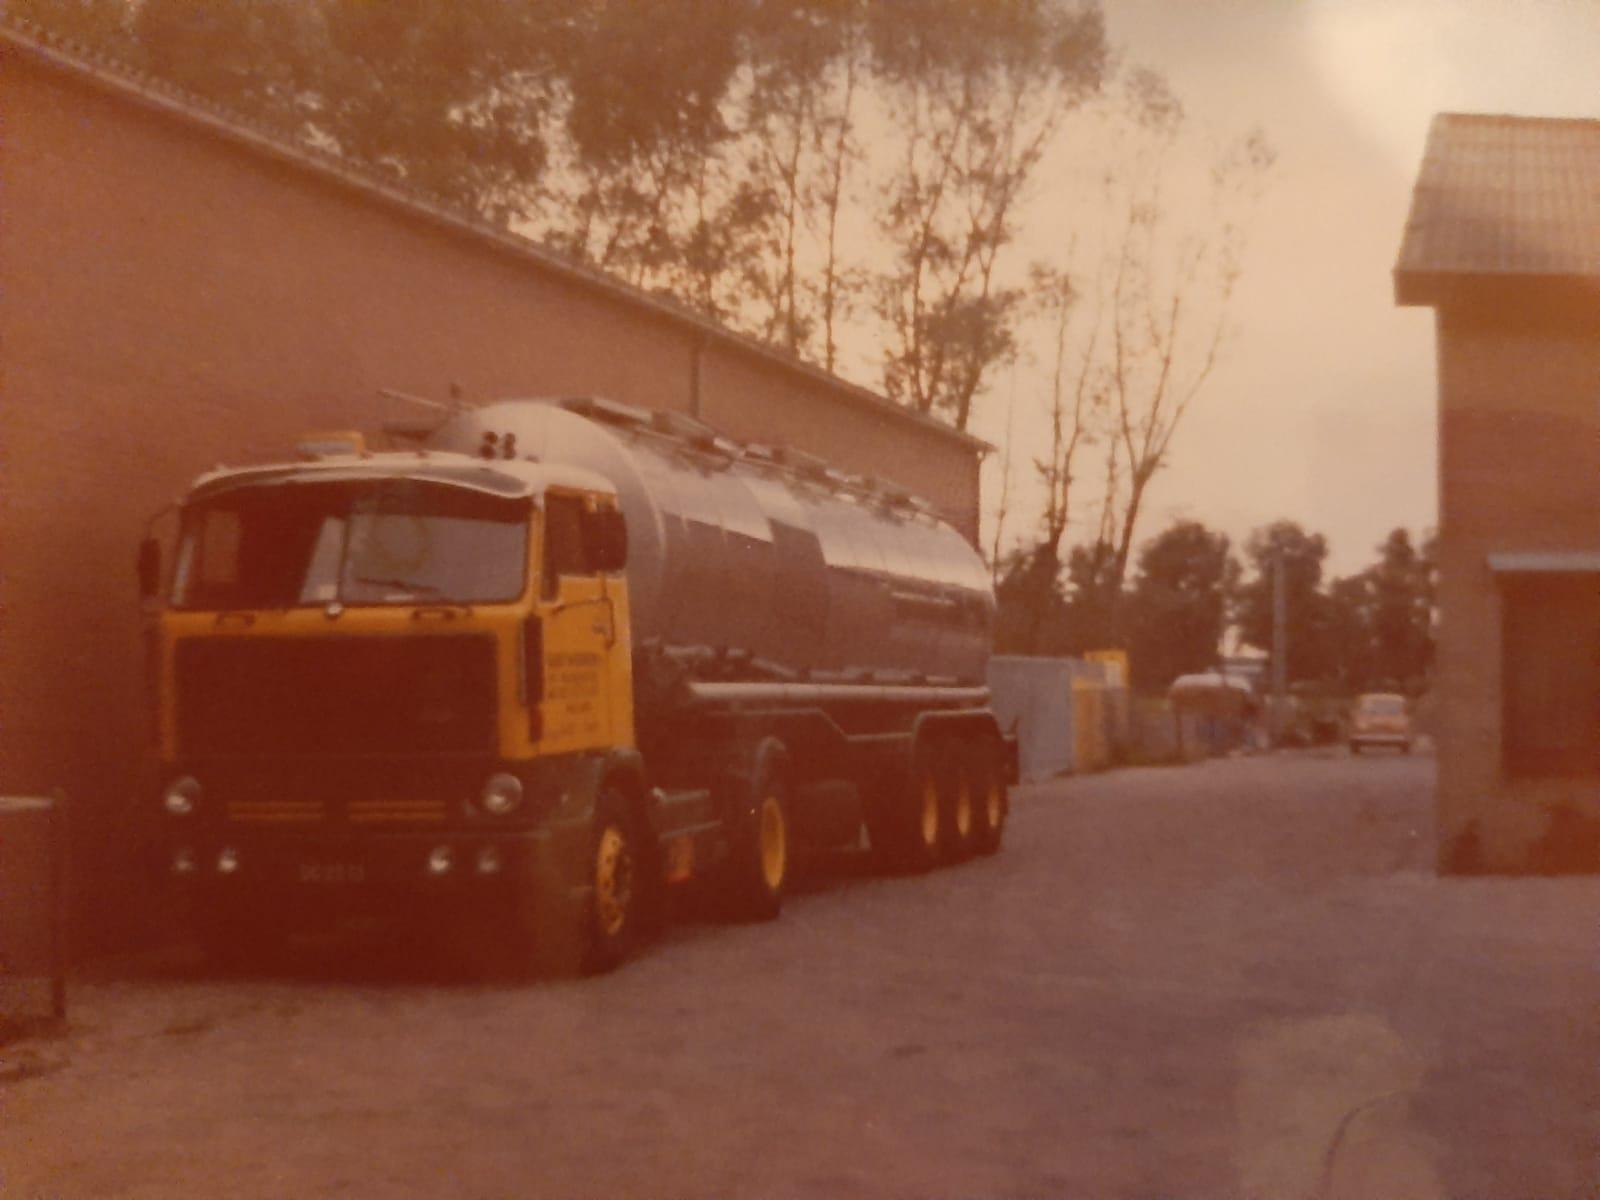 0-Volvo-F-89-2